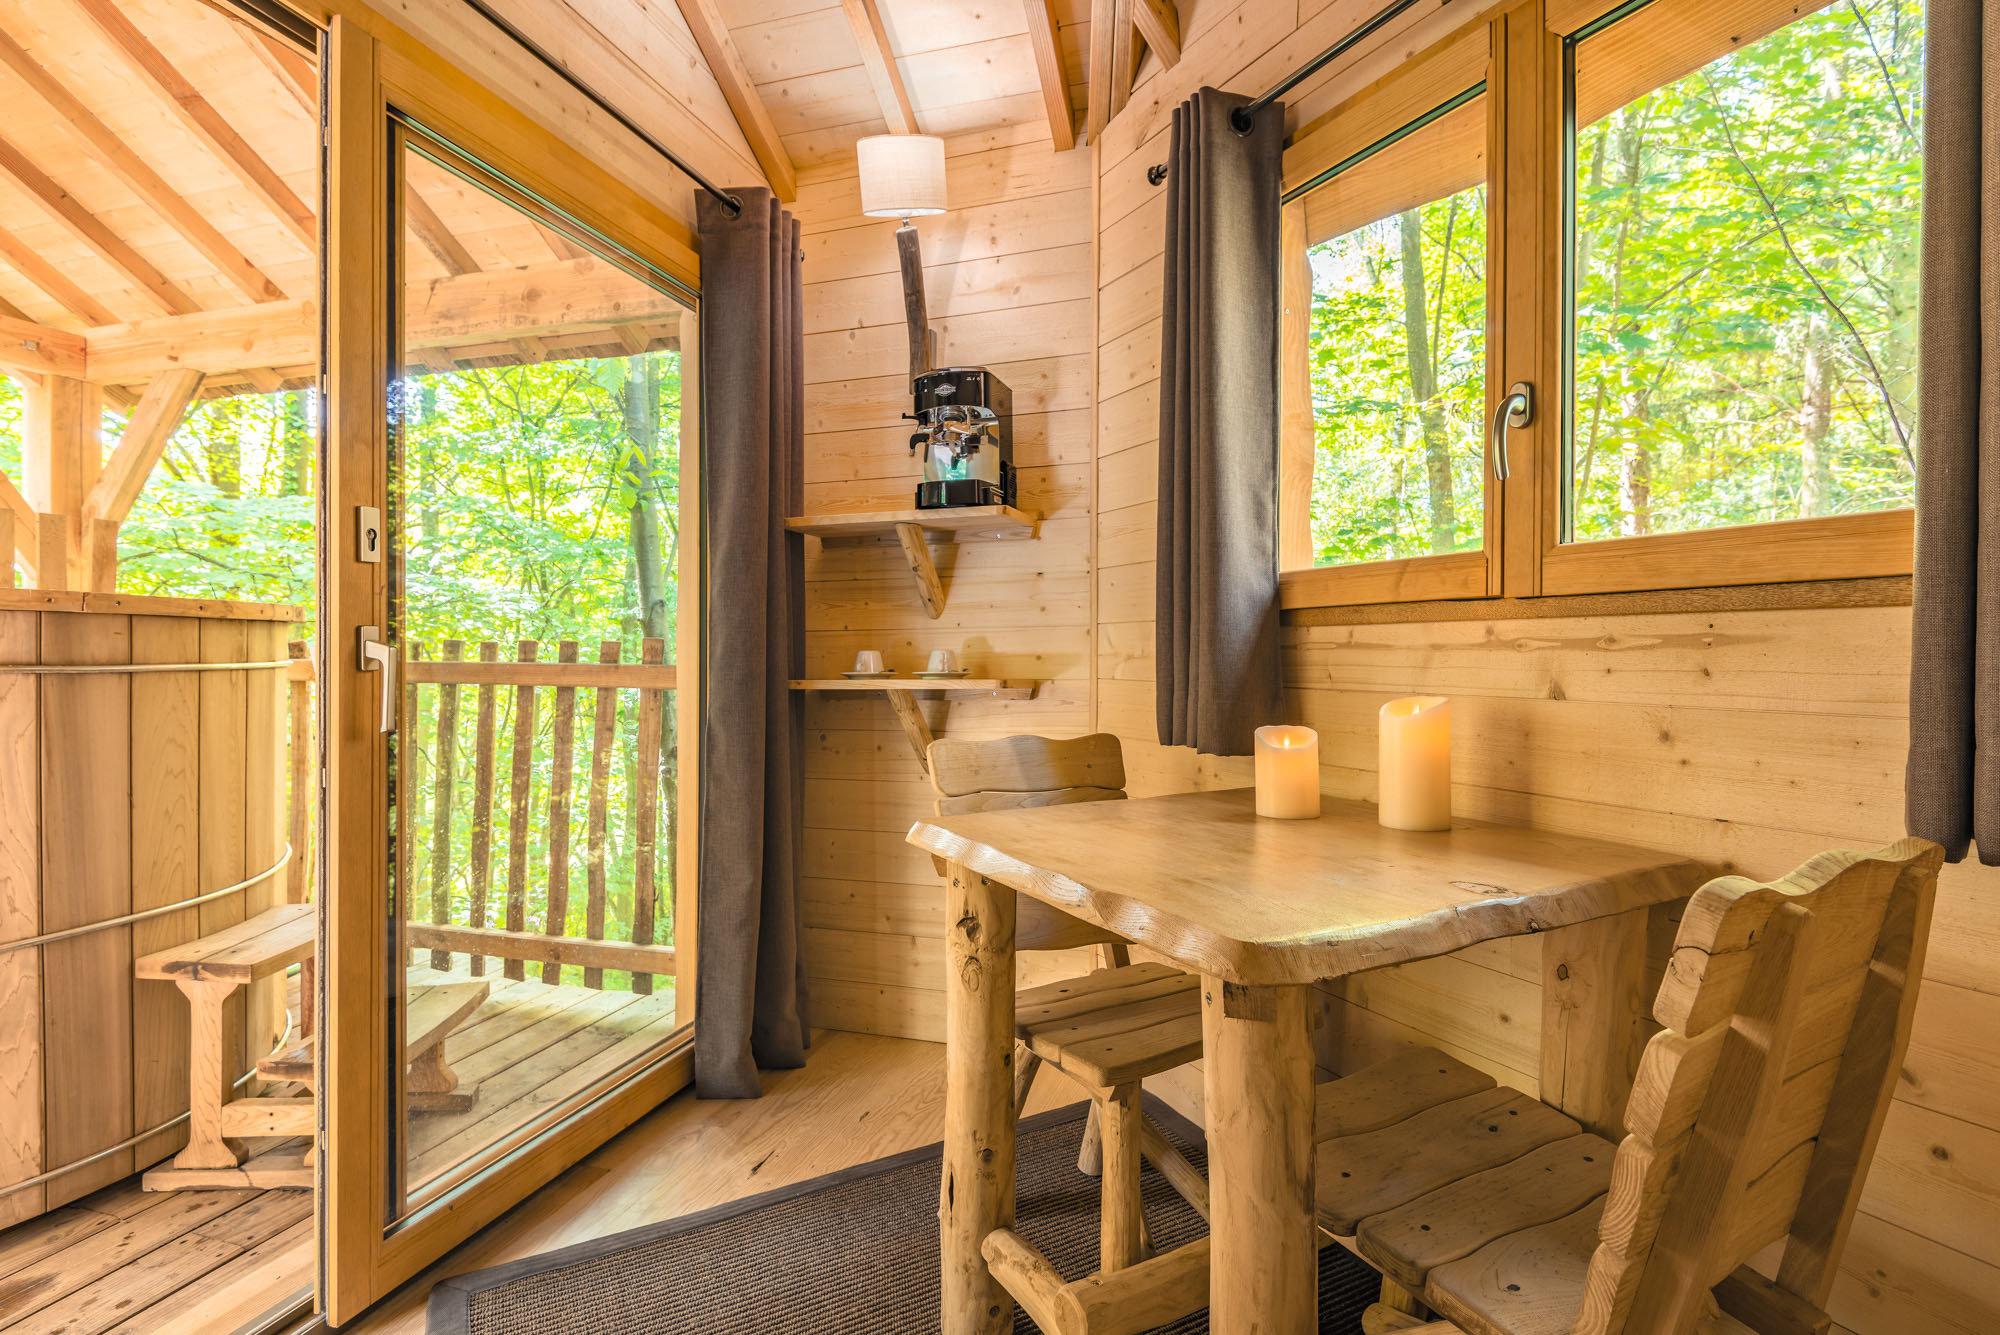 cabane lov 39 nid spa dans les arbres c t de paris. Black Bedroom Furniture Sets. Home Design Ideas